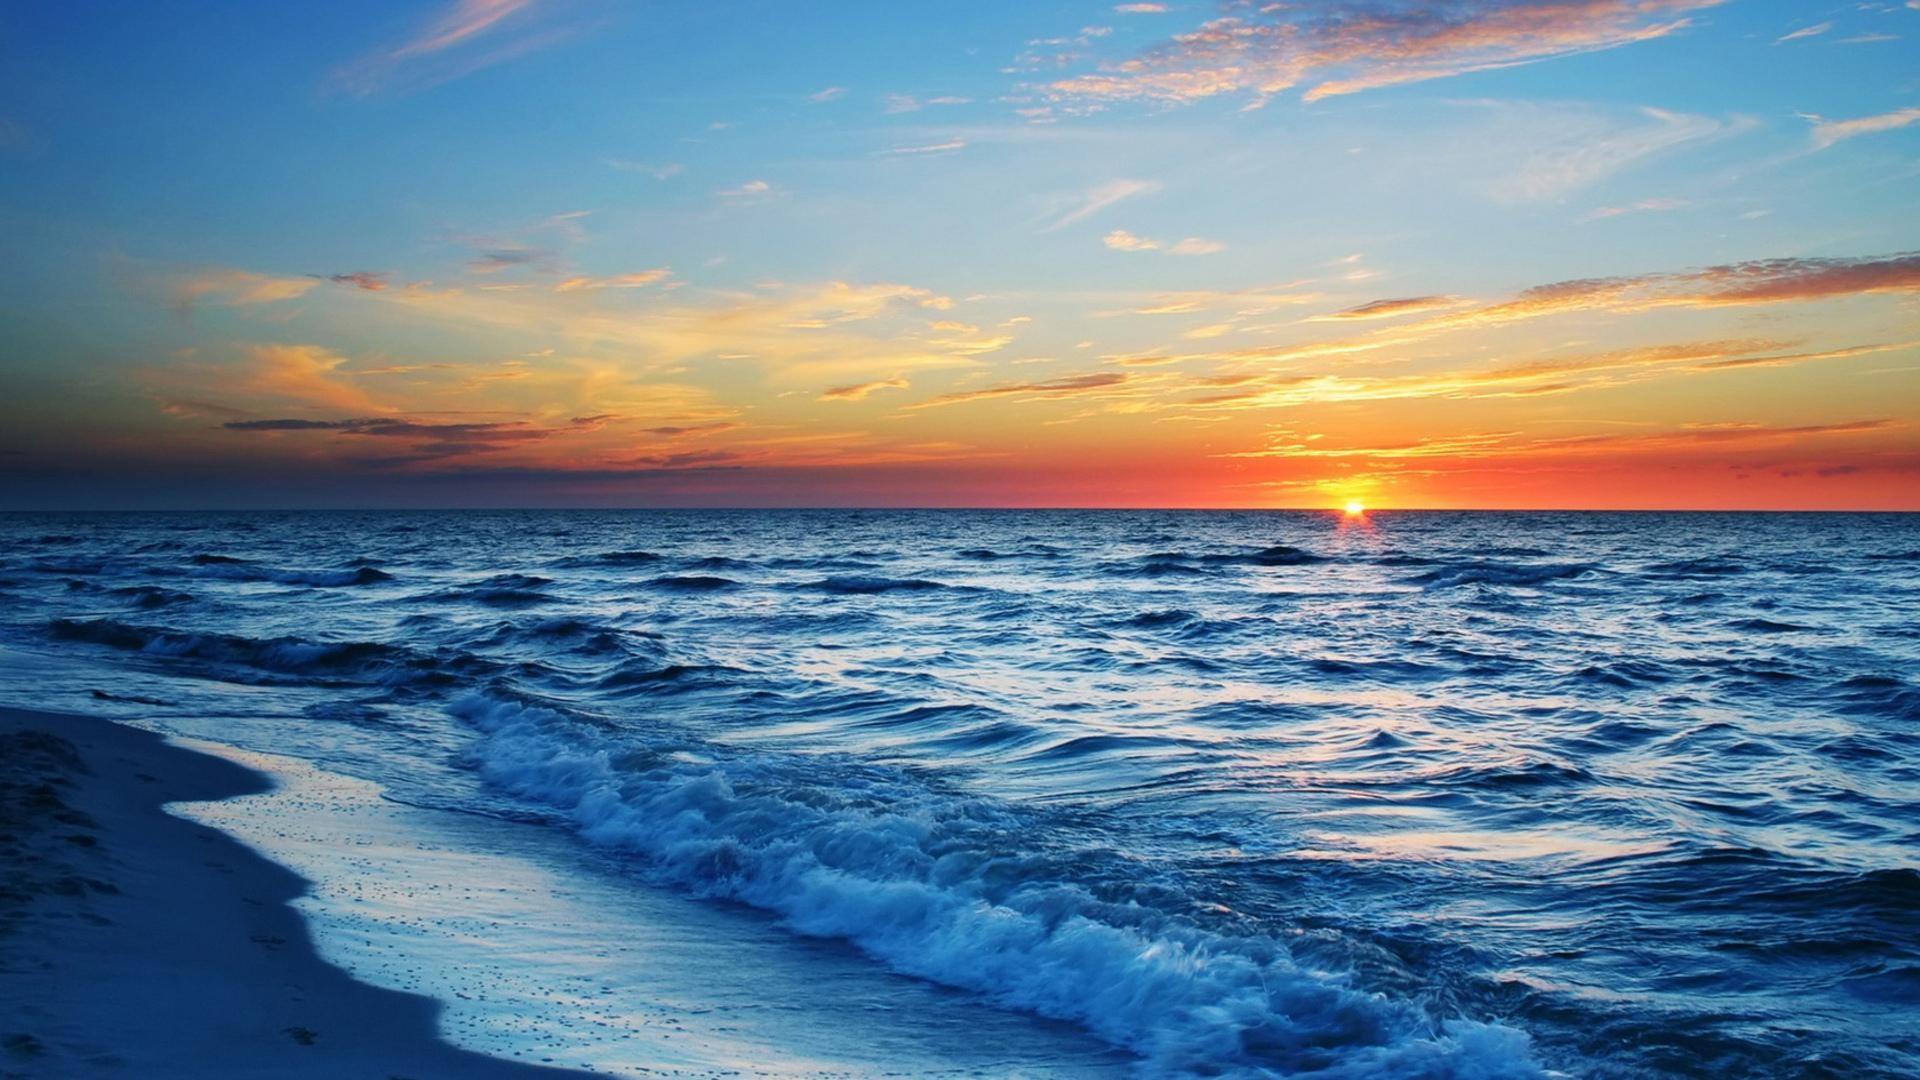 Res: 1920x1080, Ocean Sunset